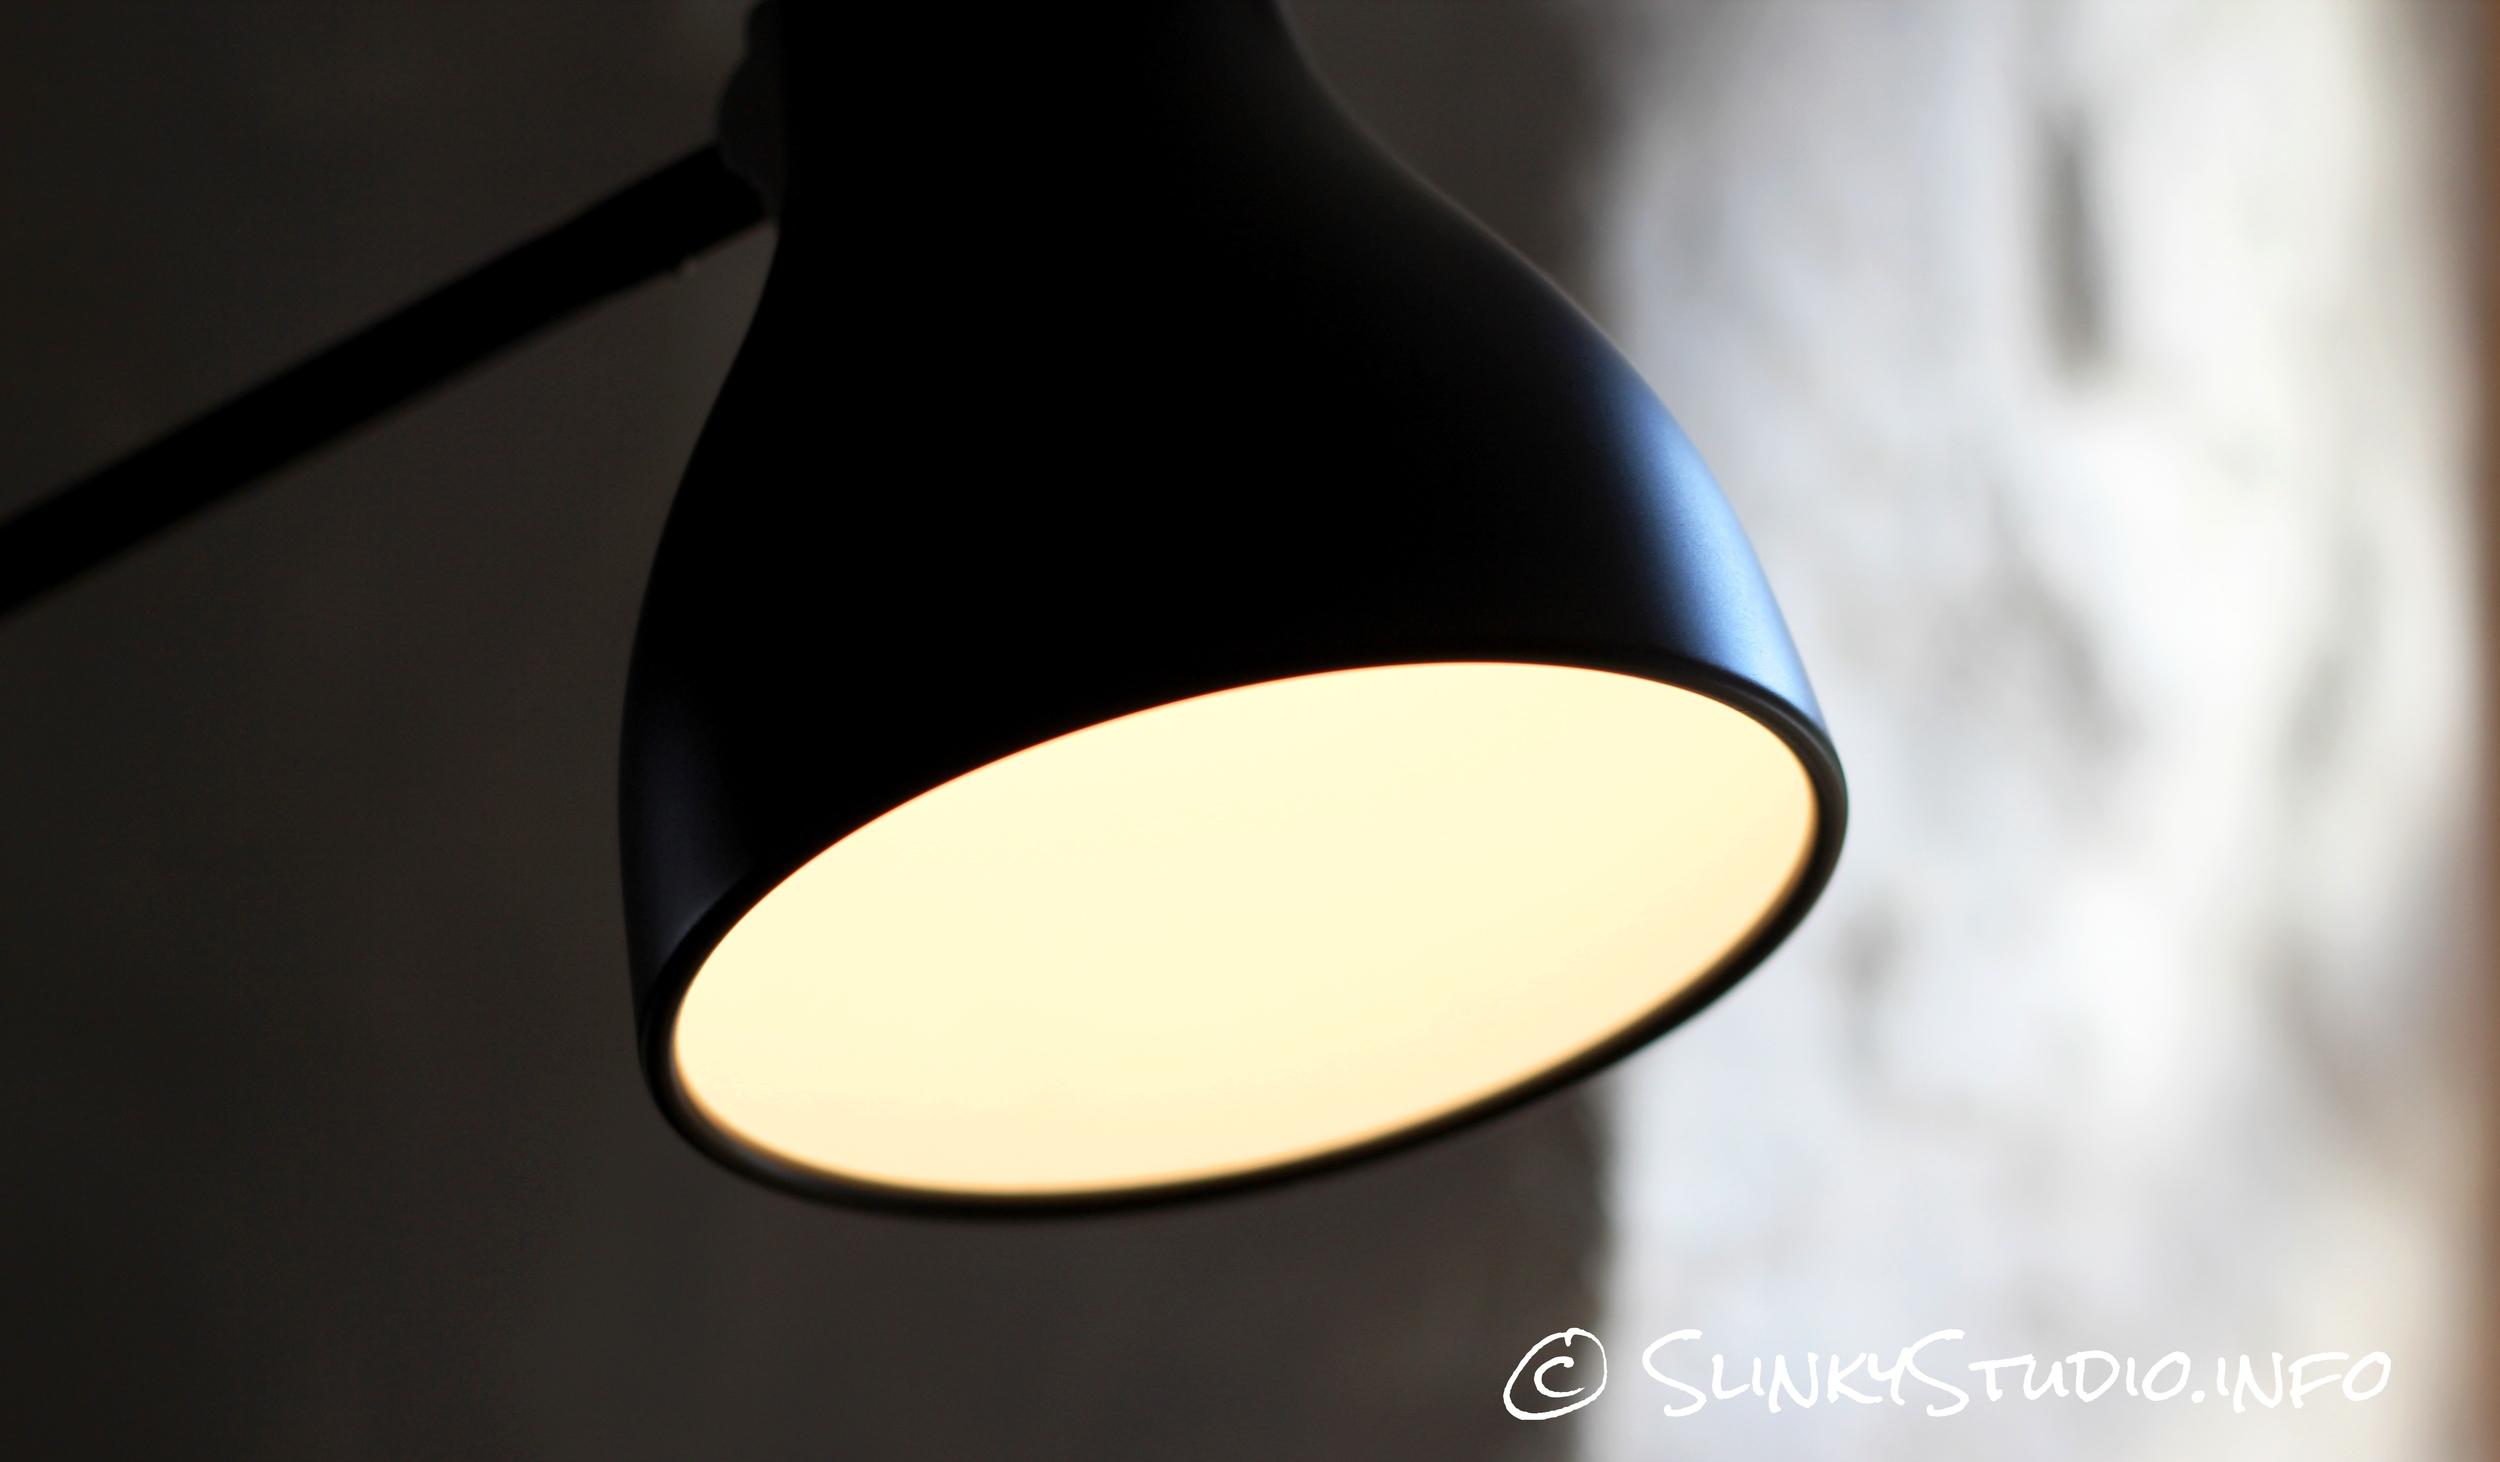 Anglepoise Type75 LED Lamp Glow.jpg